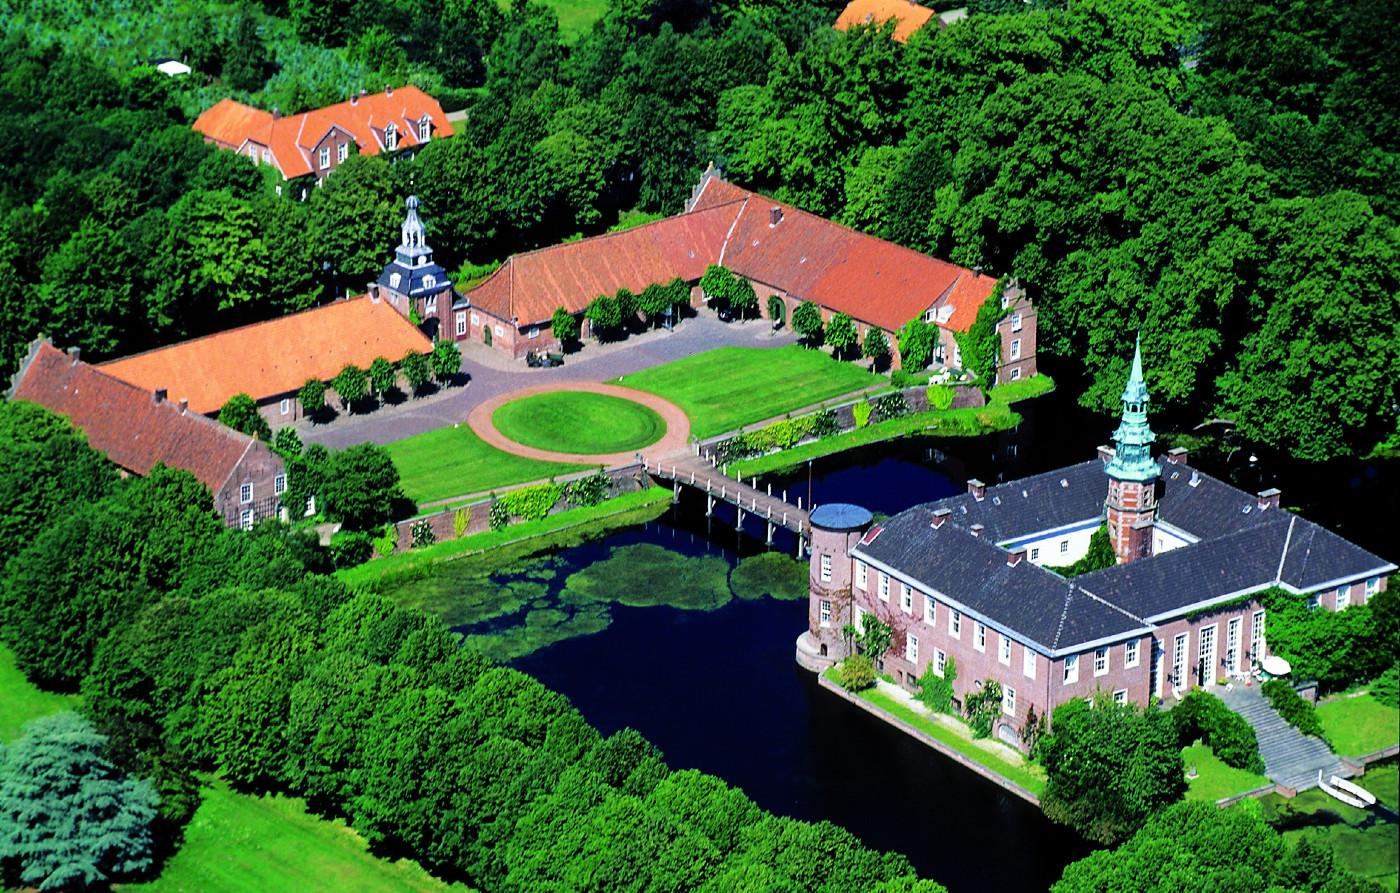 Luftbild Schloss Lütetsburg